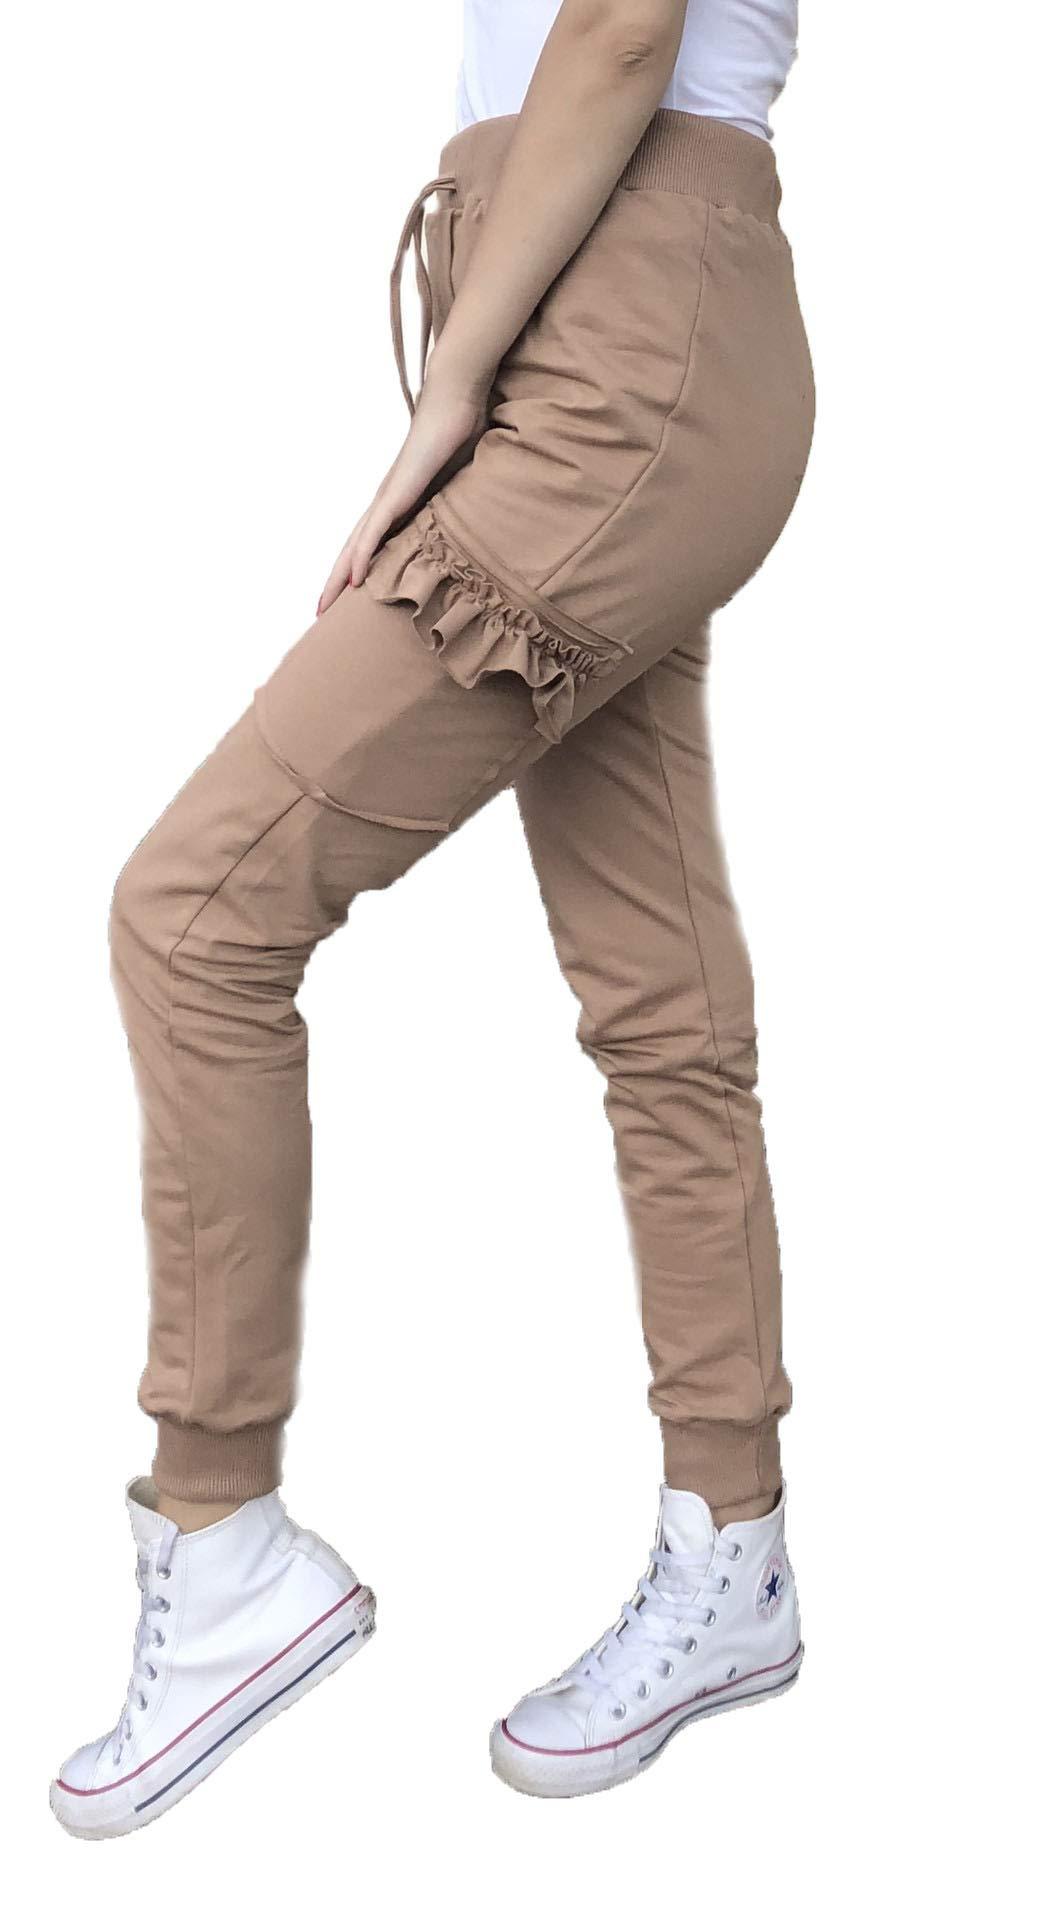 mettime US Girls Fashions Solid Color Adjustable Waistband Patchwork Ruffles High Waist Skinny Pants (Khaki, L)